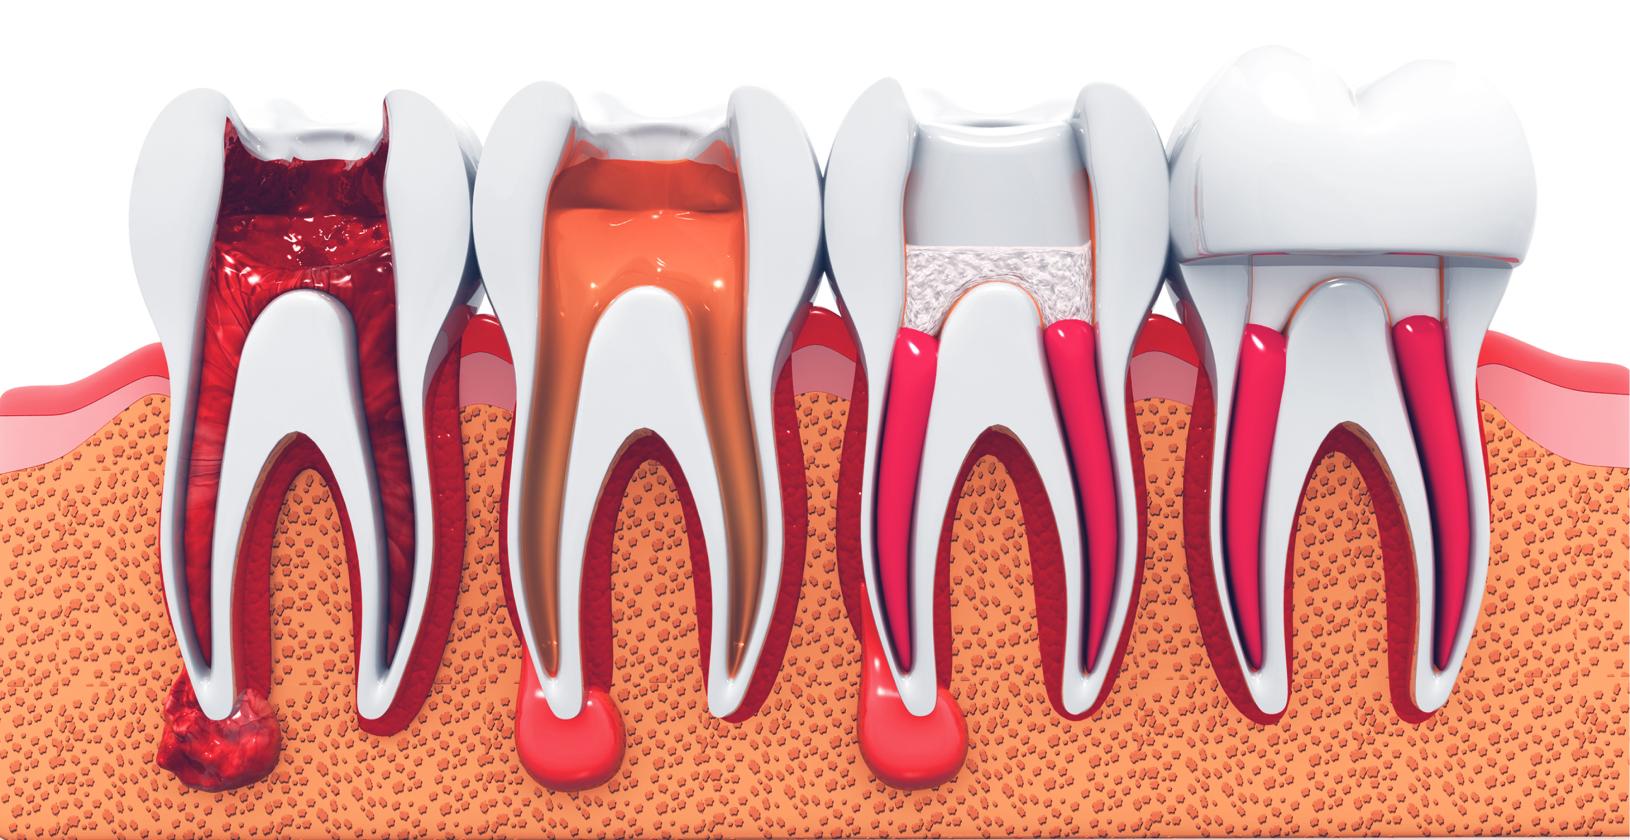 Tandara Dental Root Canals